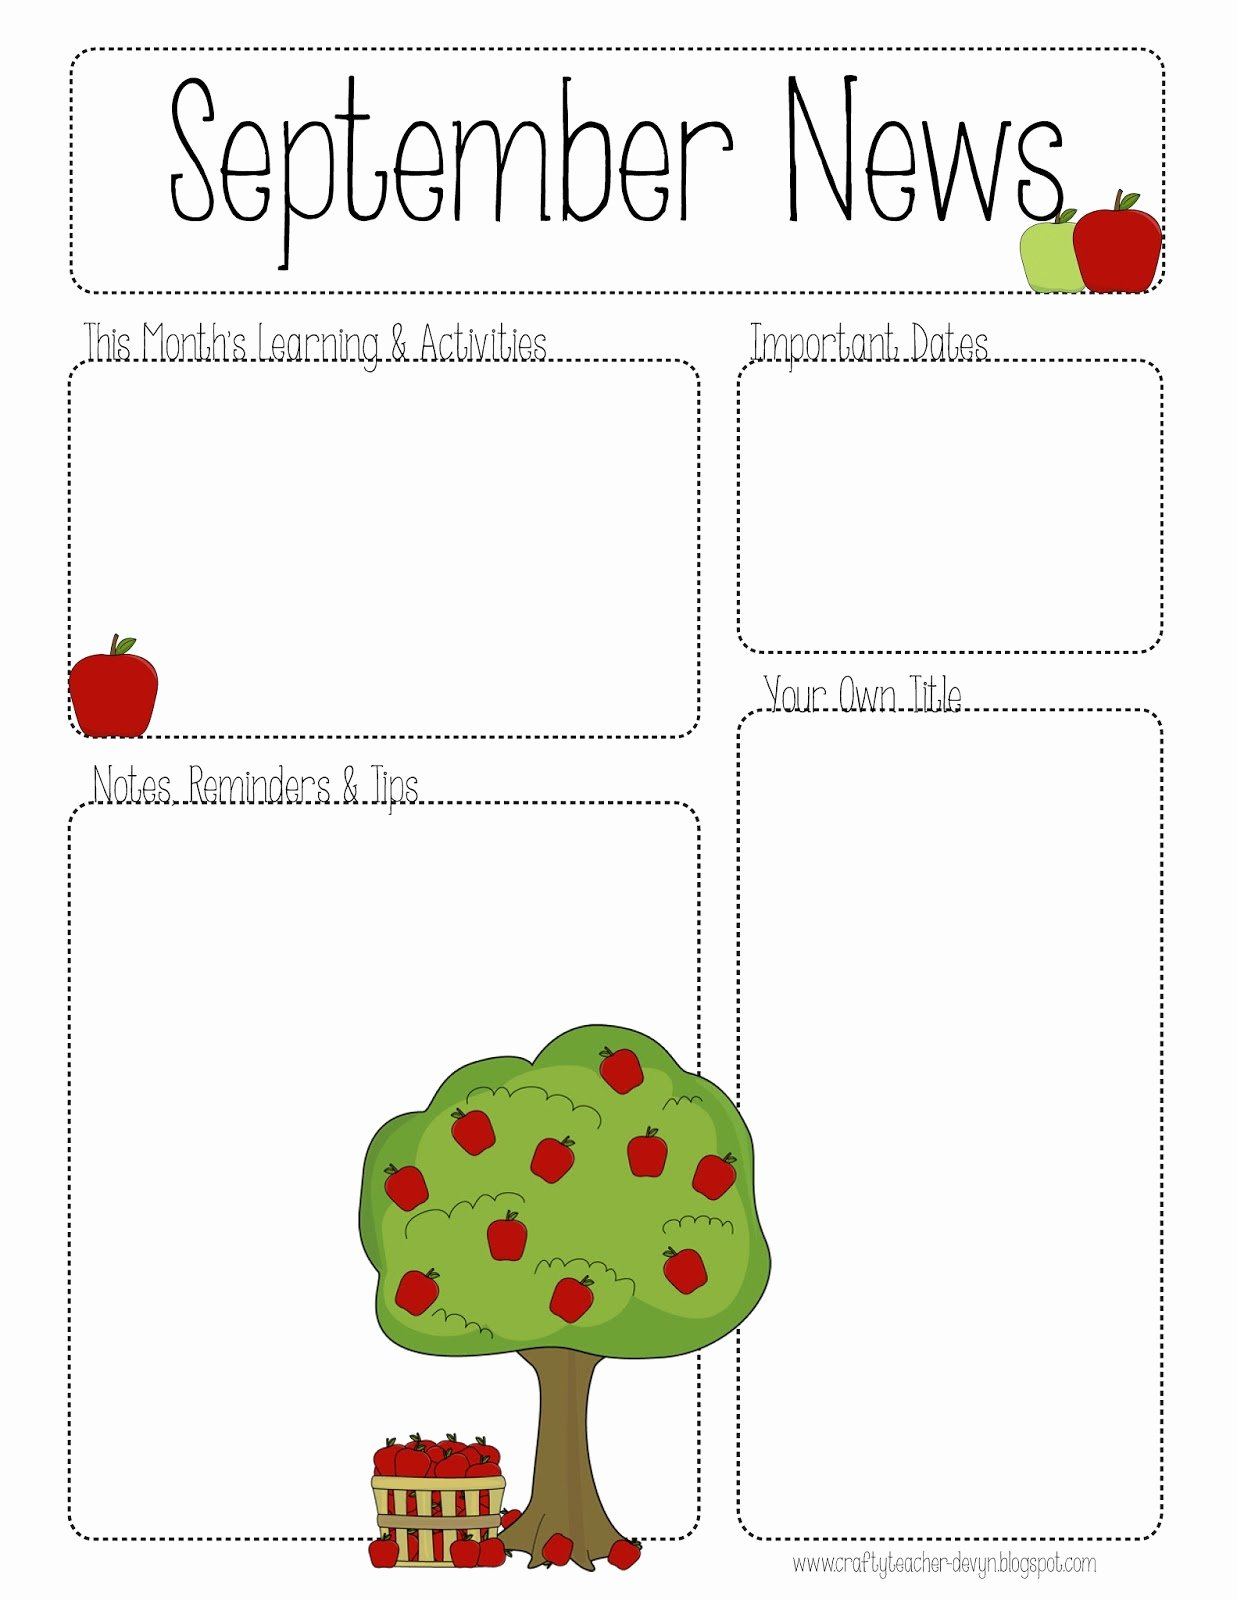 Preschool Newsletter Templates Free Unique September Printable Newsletter All Grades